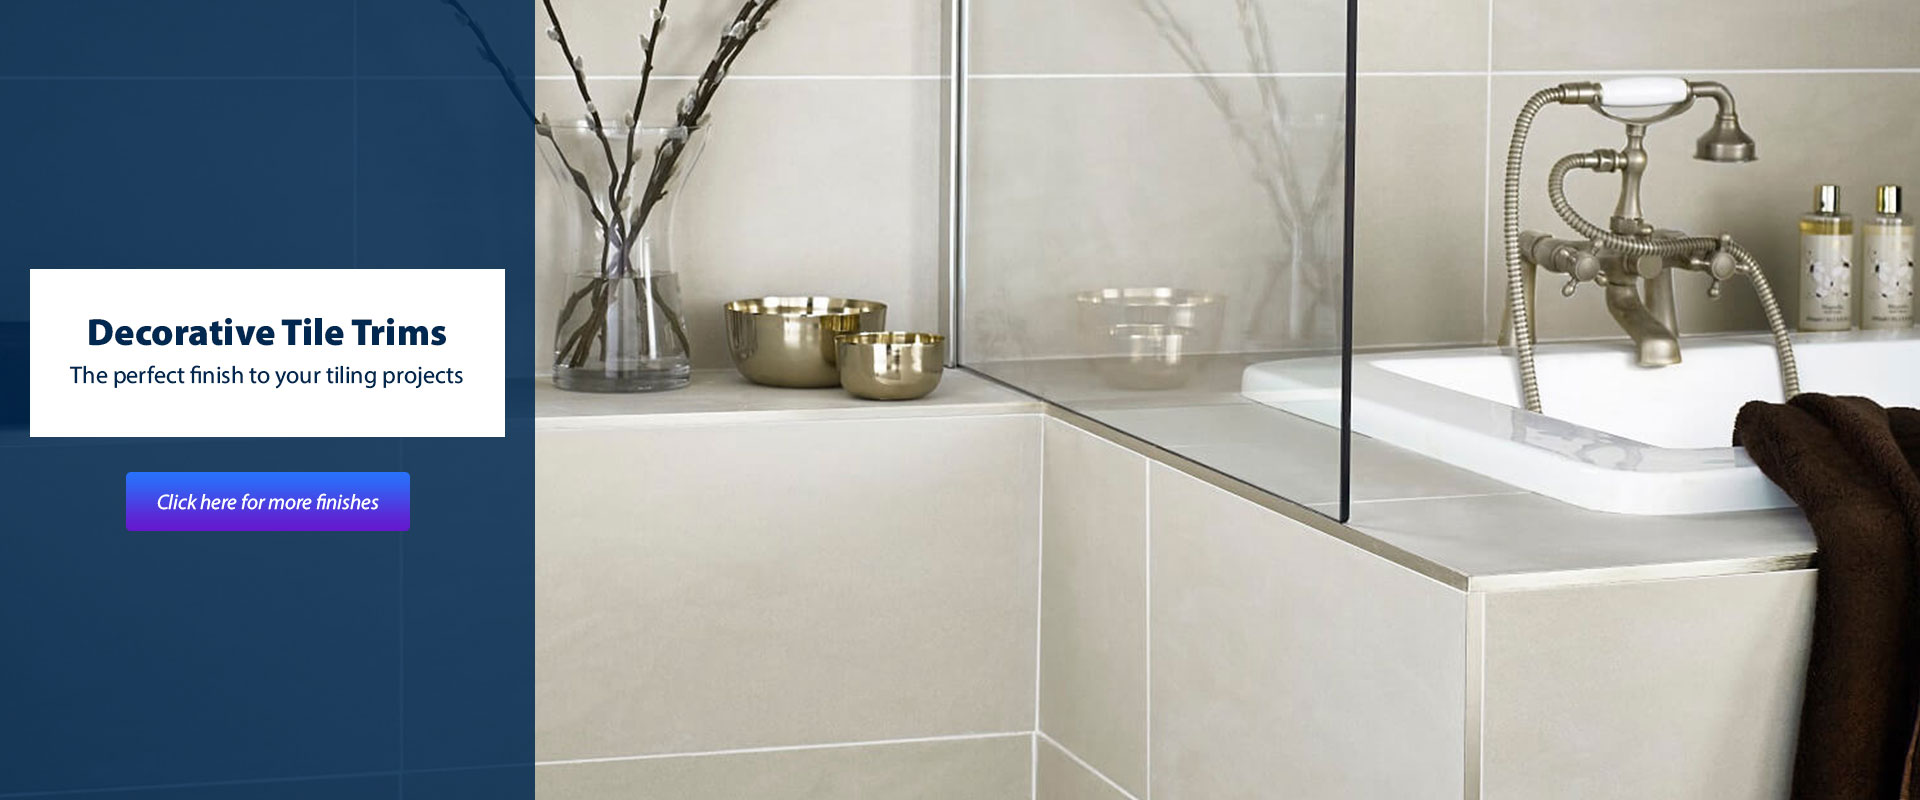 decorative tile trim